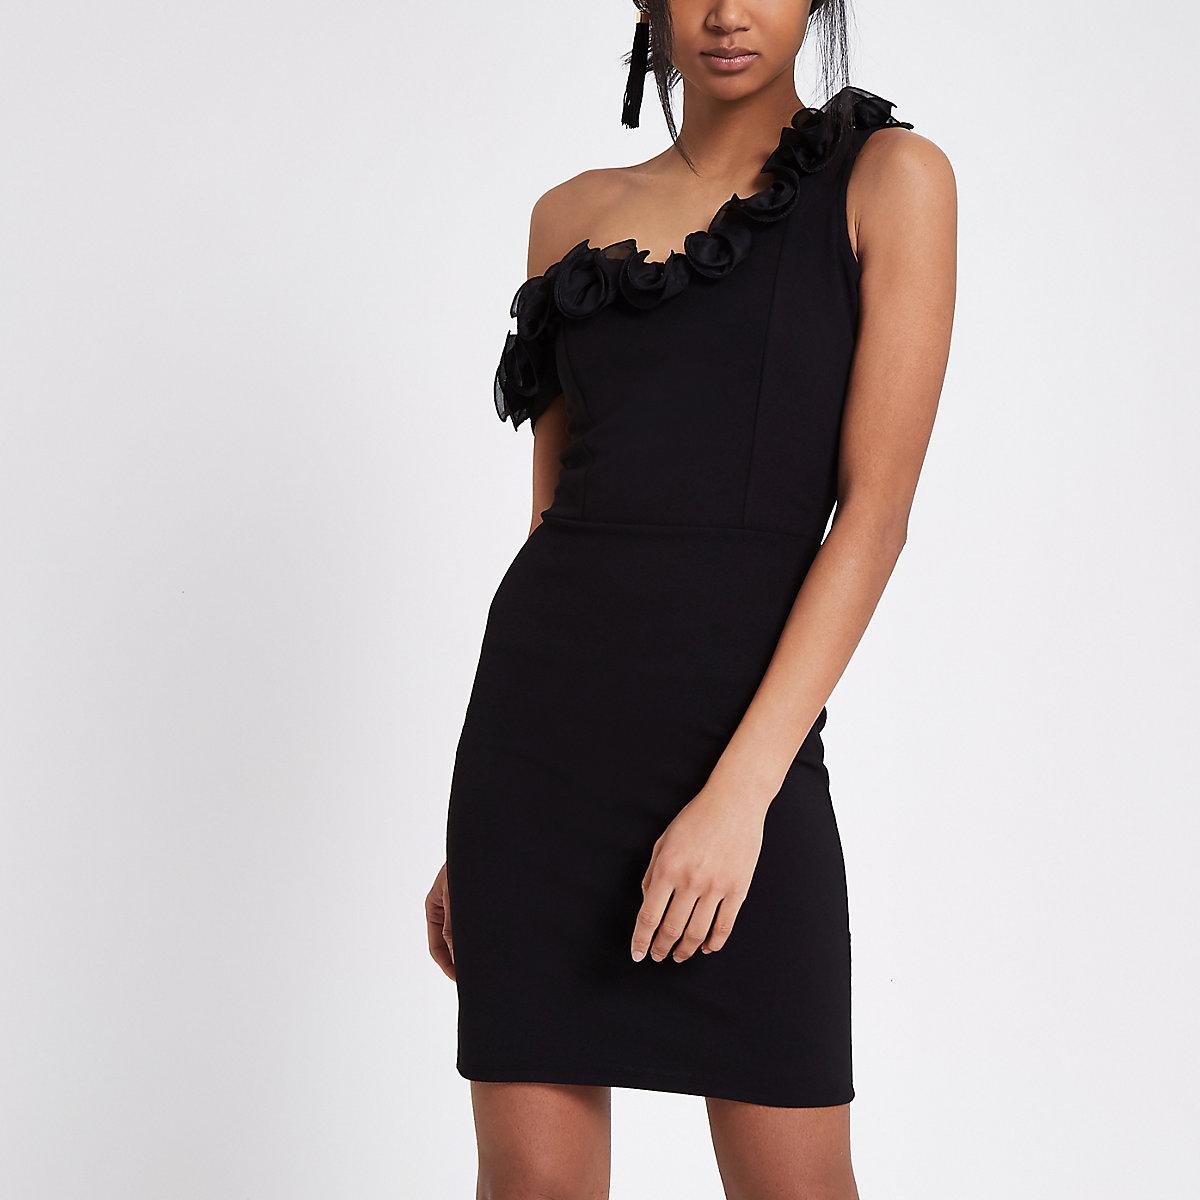 Black one shoulder frill bodycon dress